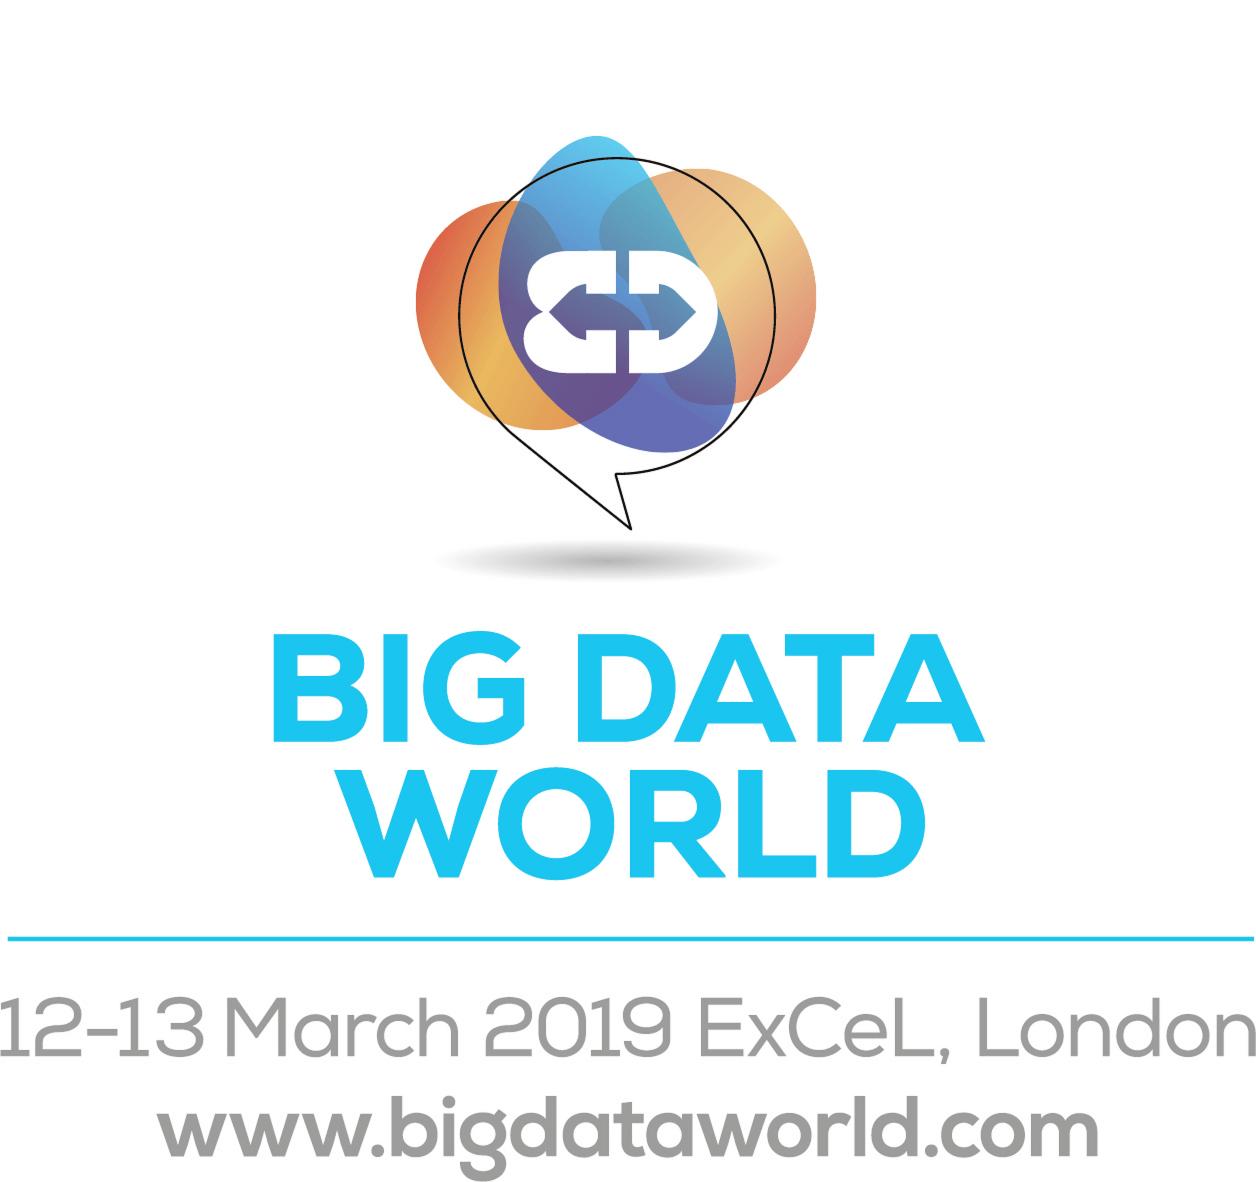 Big Data World London, ExCeL 12-13th March 2019